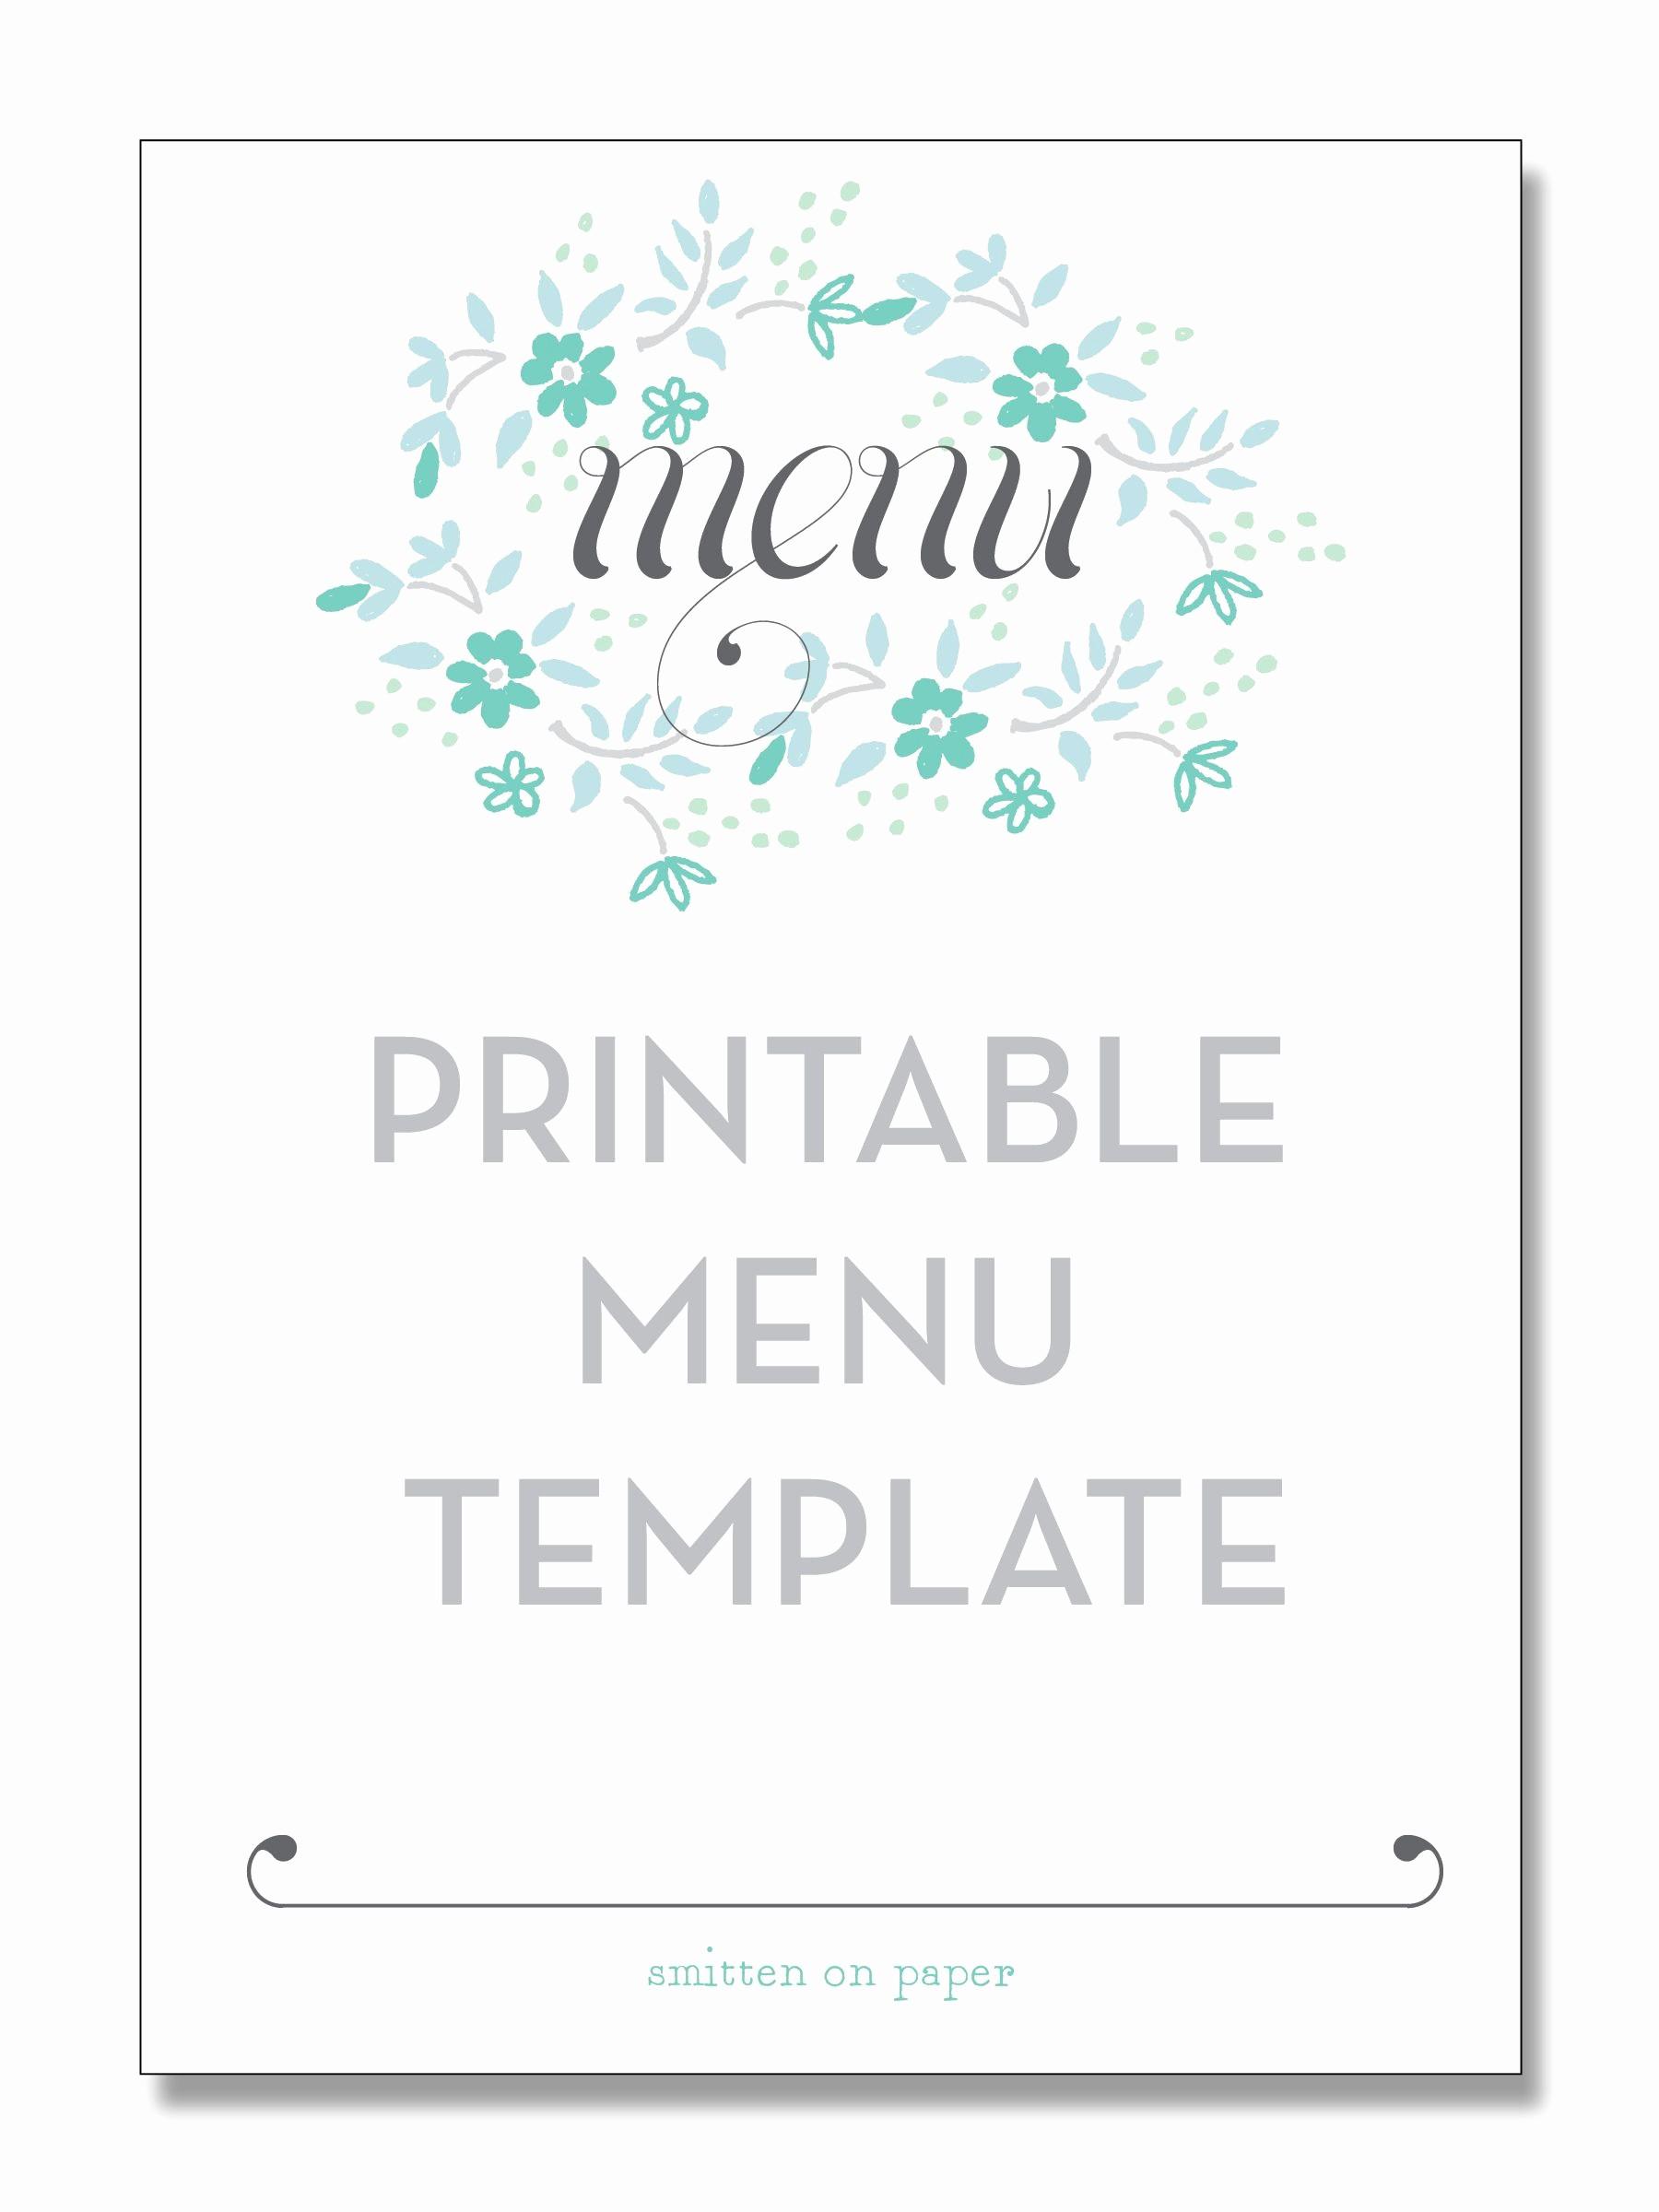 Restaurant Menu Template Free Download Elegant Freebie Friday Printable Menu Party Time